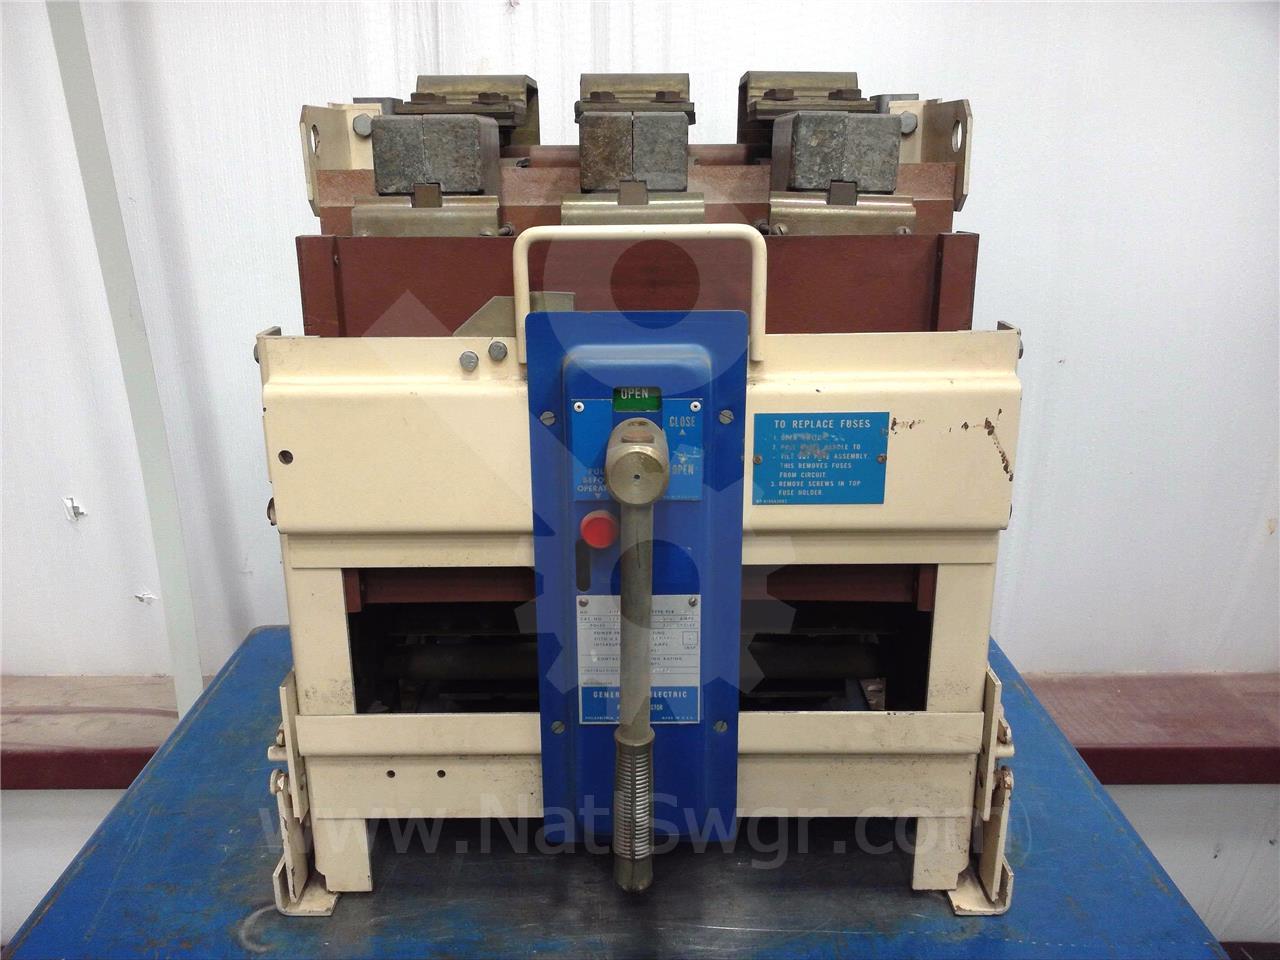 General Electric 1200A GE 6PLB12 MO/BI